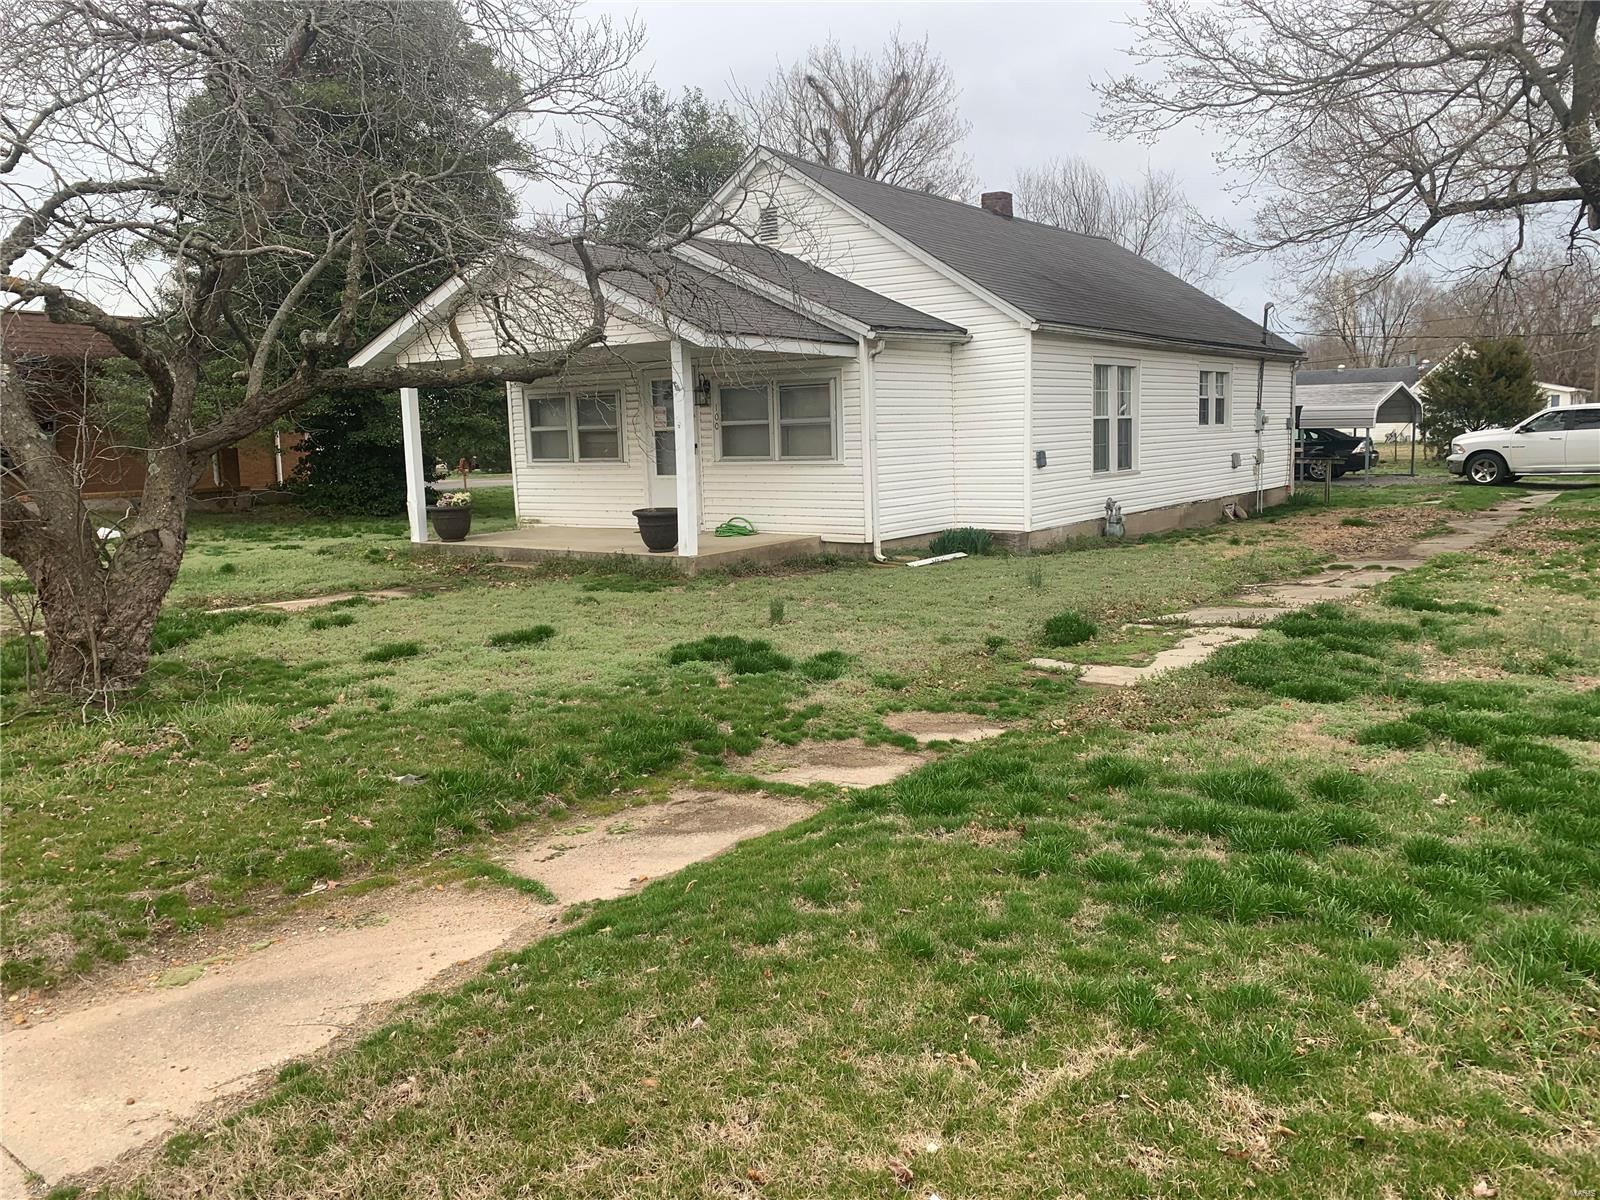 100 N Kirkwood Property Photo - Morley, MO real estate listing